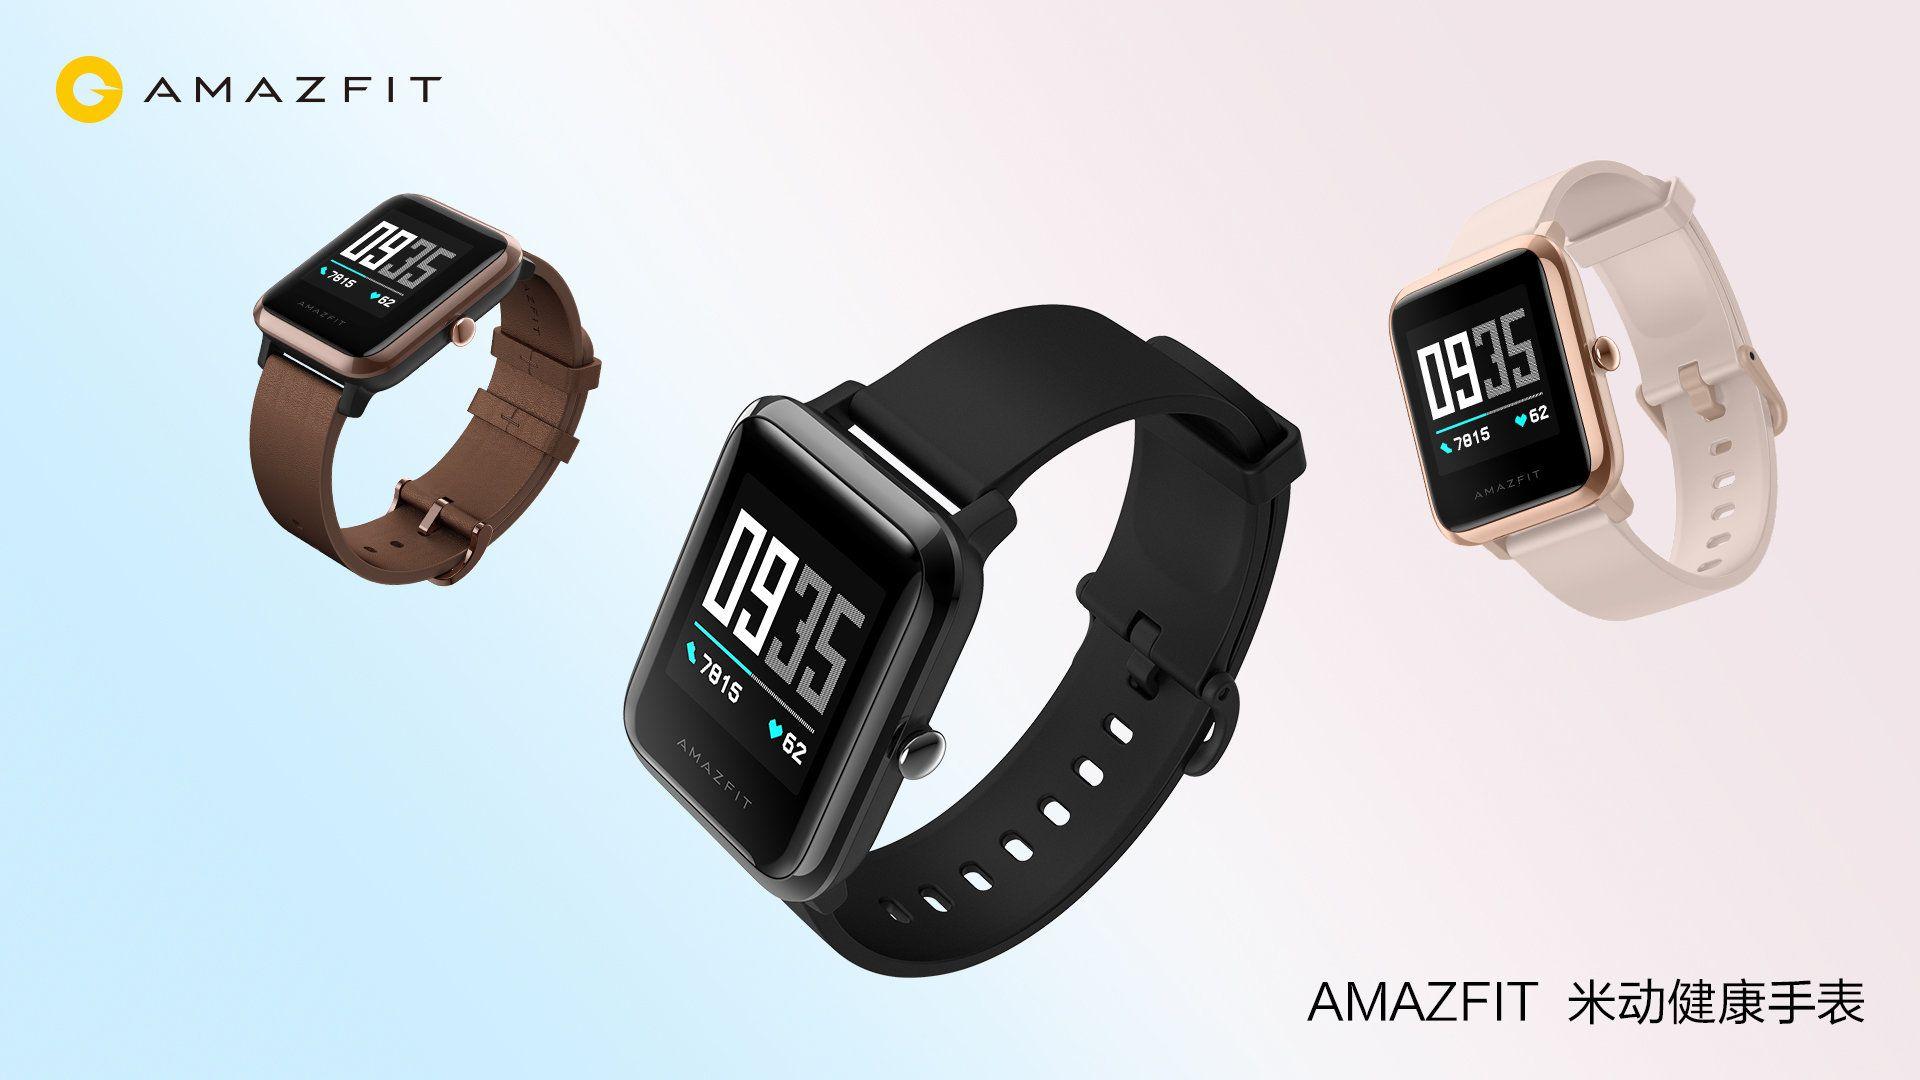 Amazfit Health Watch ufficiale: non è l'Amazfit BIP 2